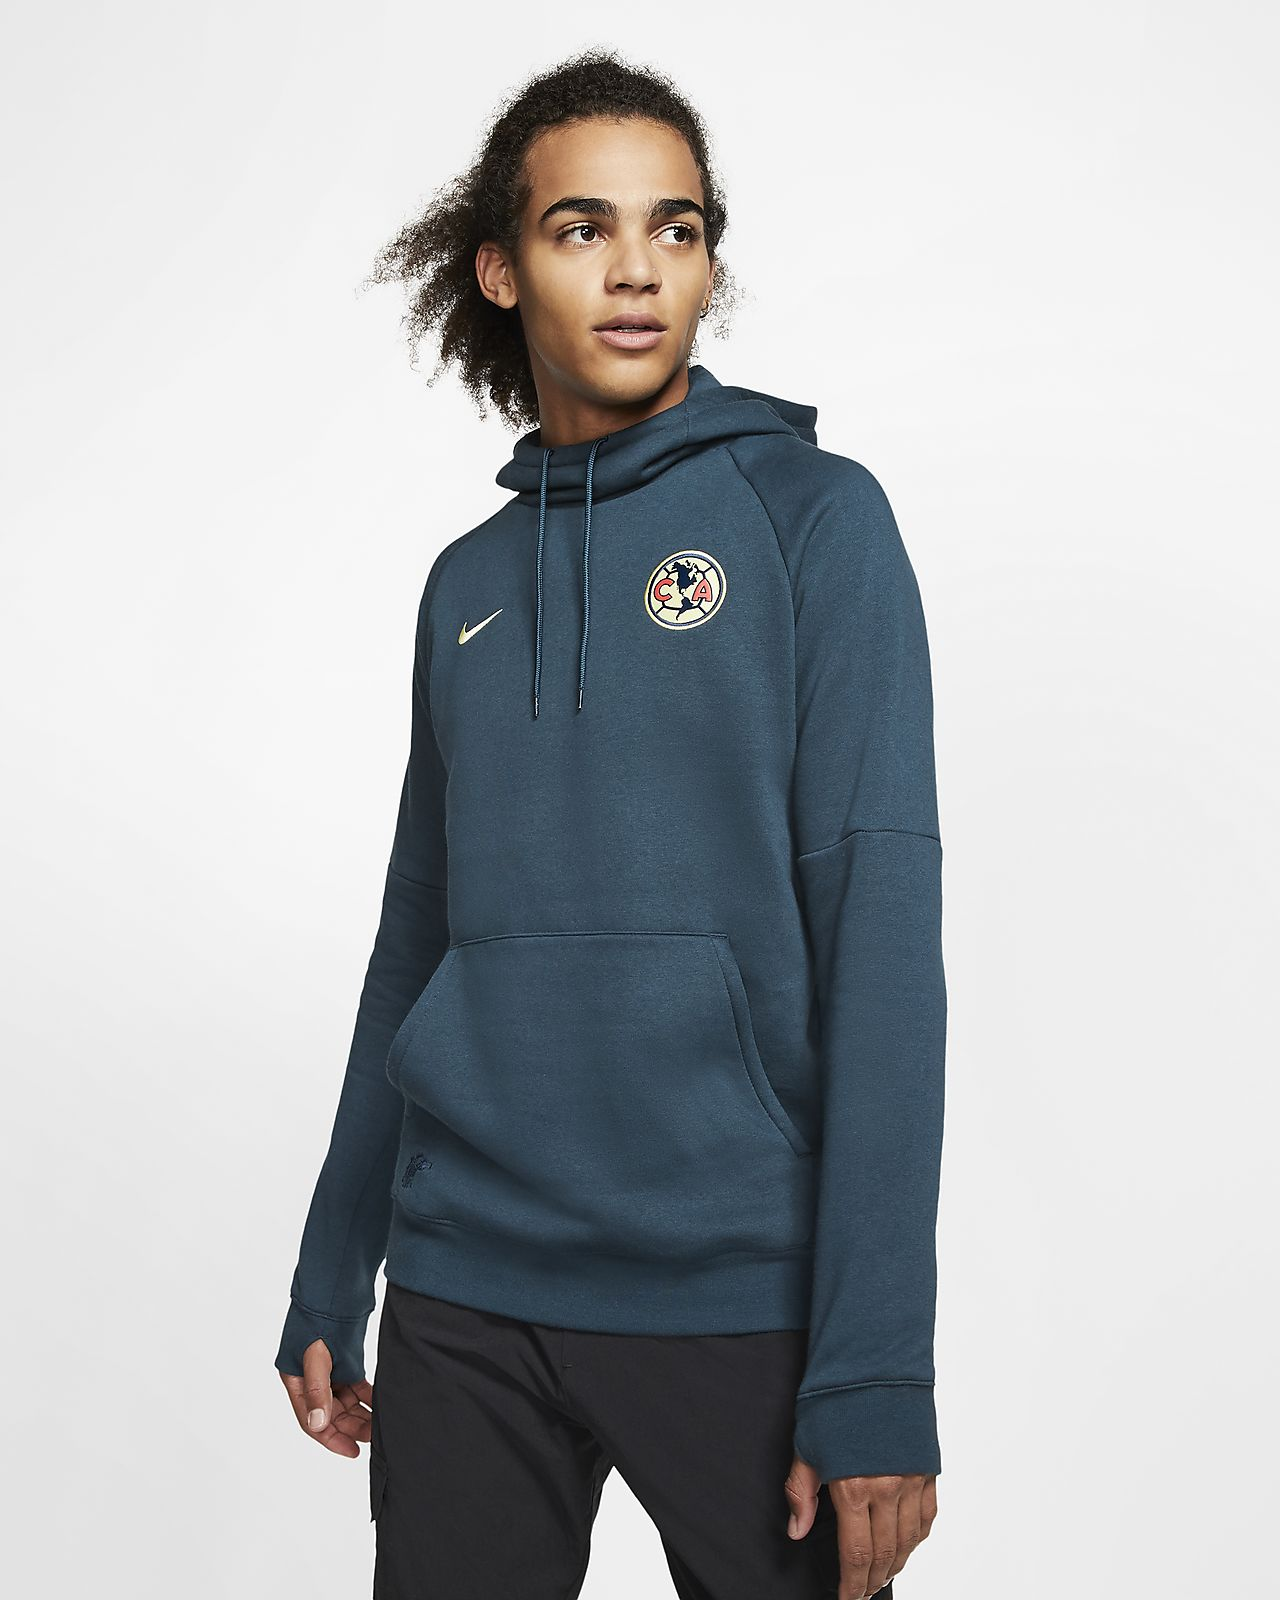 Club America Men's Fleece Pullover Soccer Hoodie